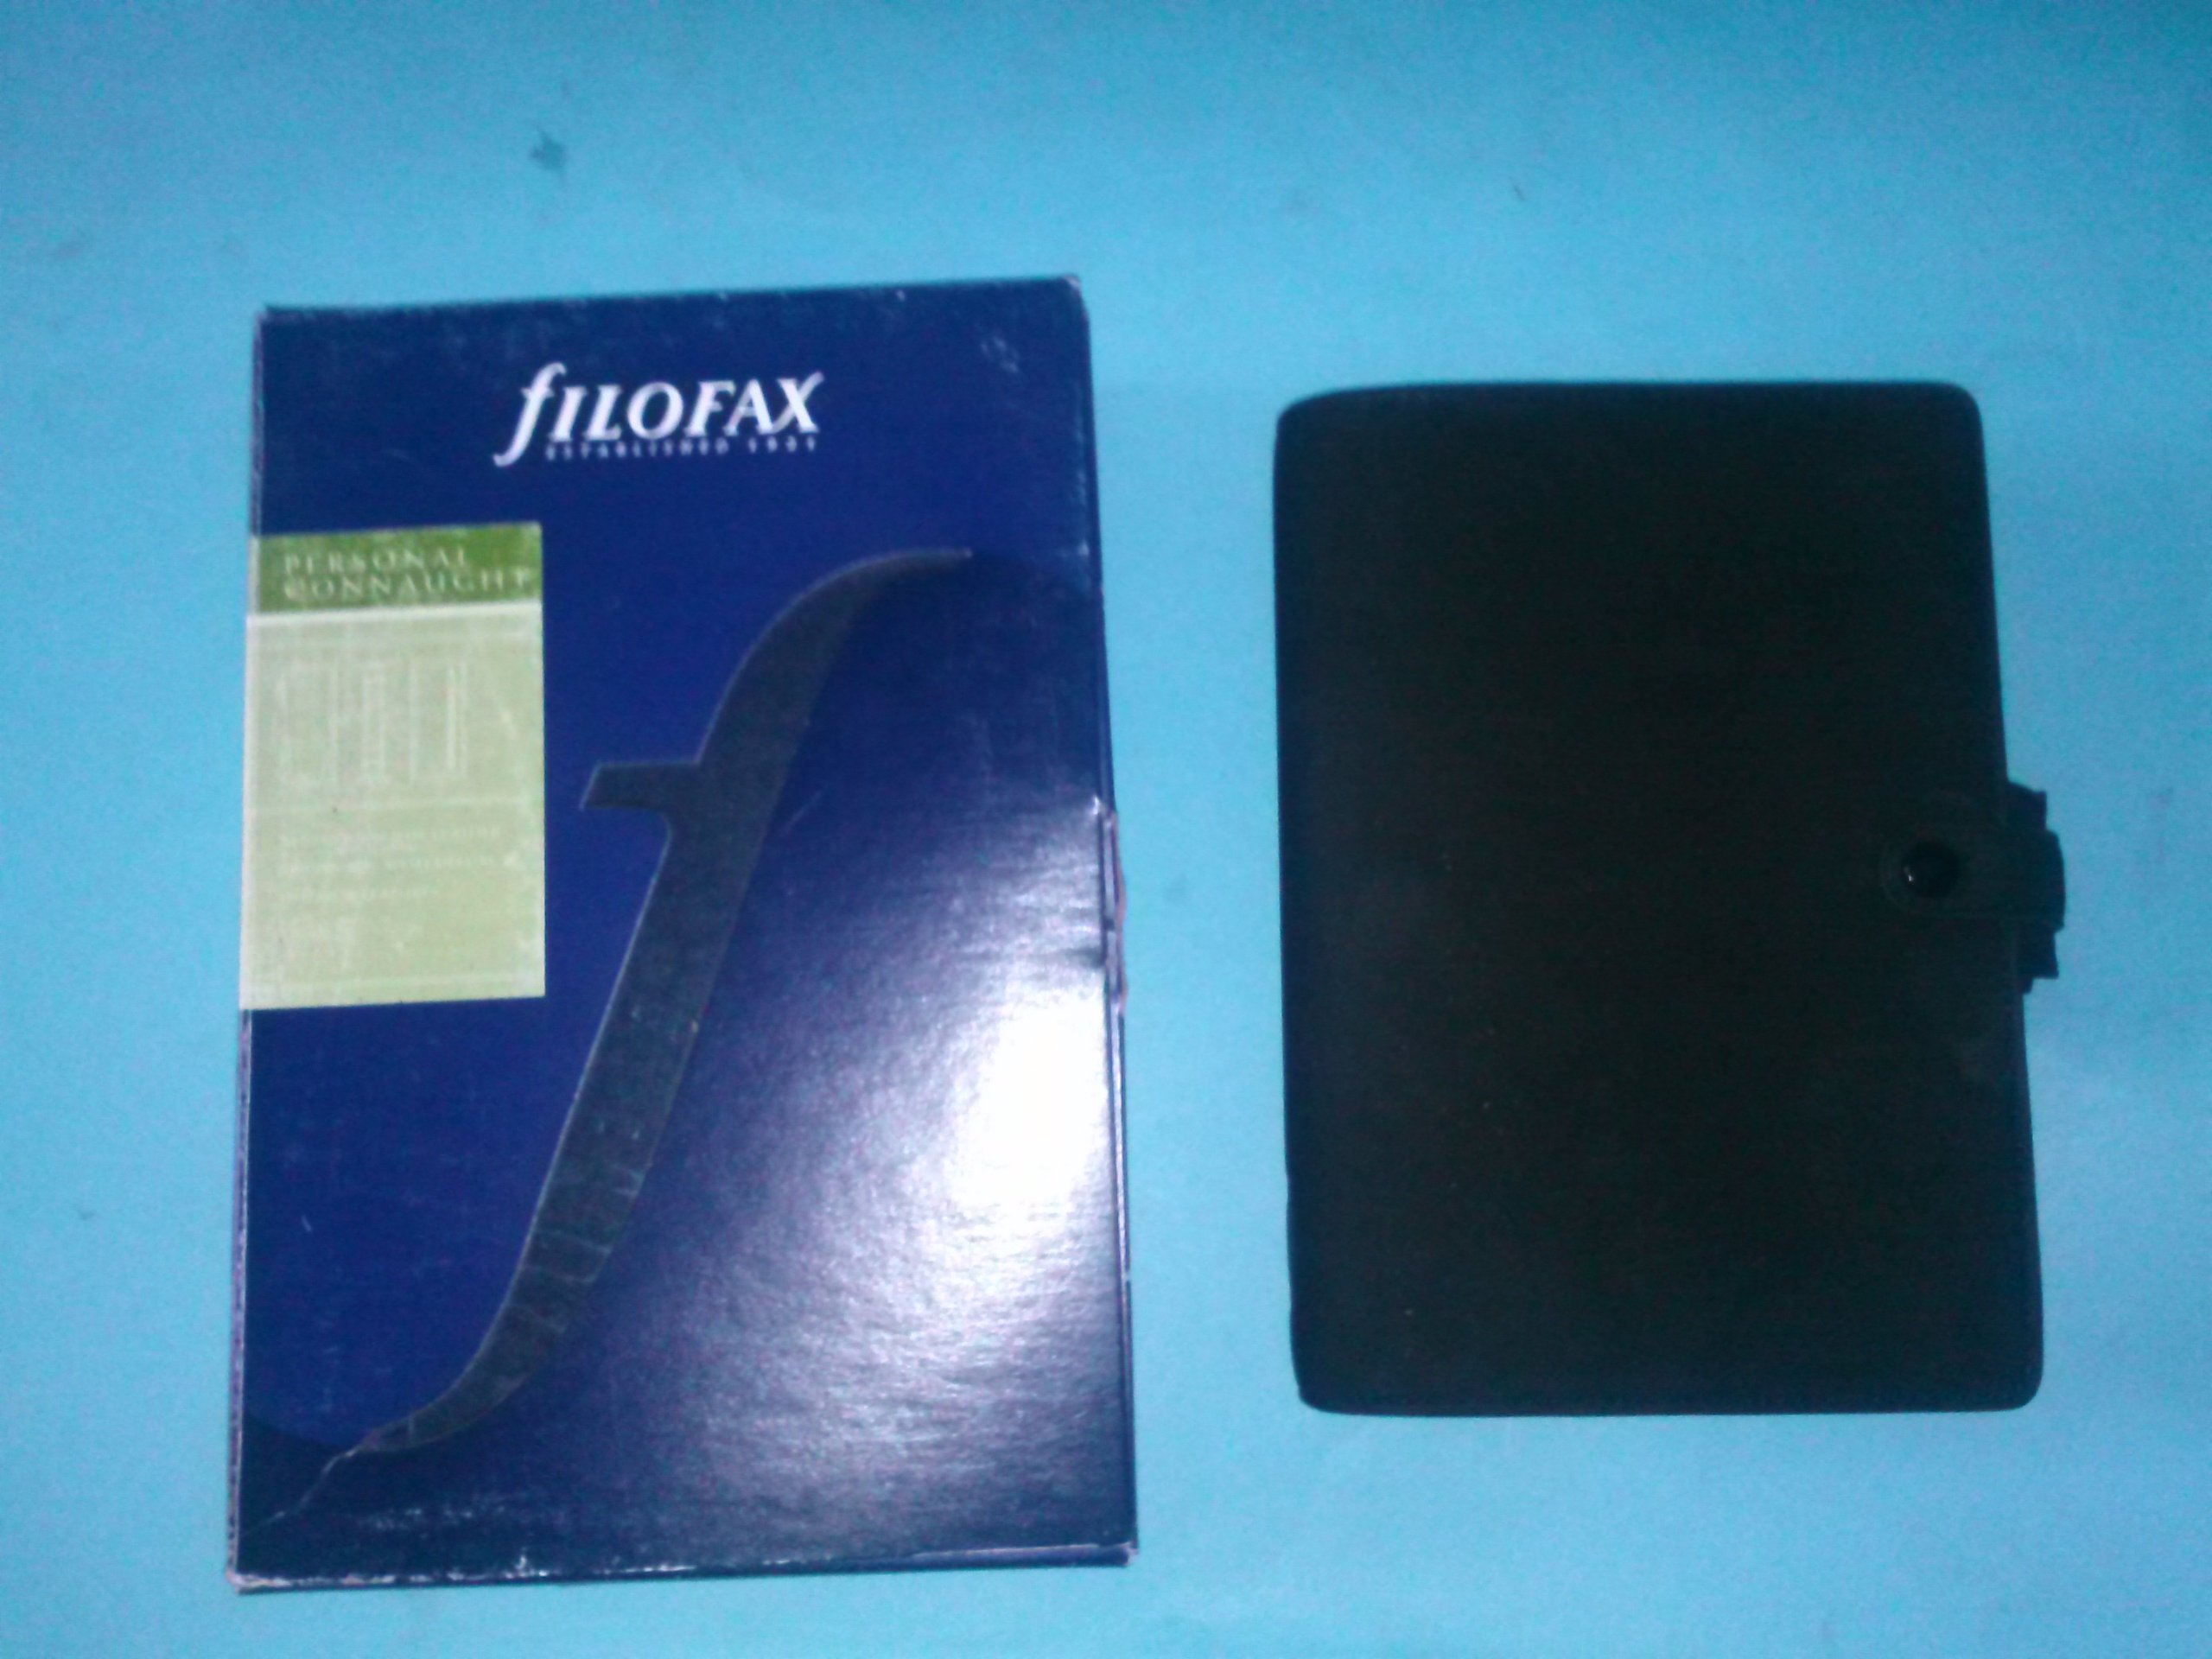 Filofax Connaught 027704 Genuine Seude Nubuck Leather Black Personal Organizer Clasp Close 2 Pen Holders